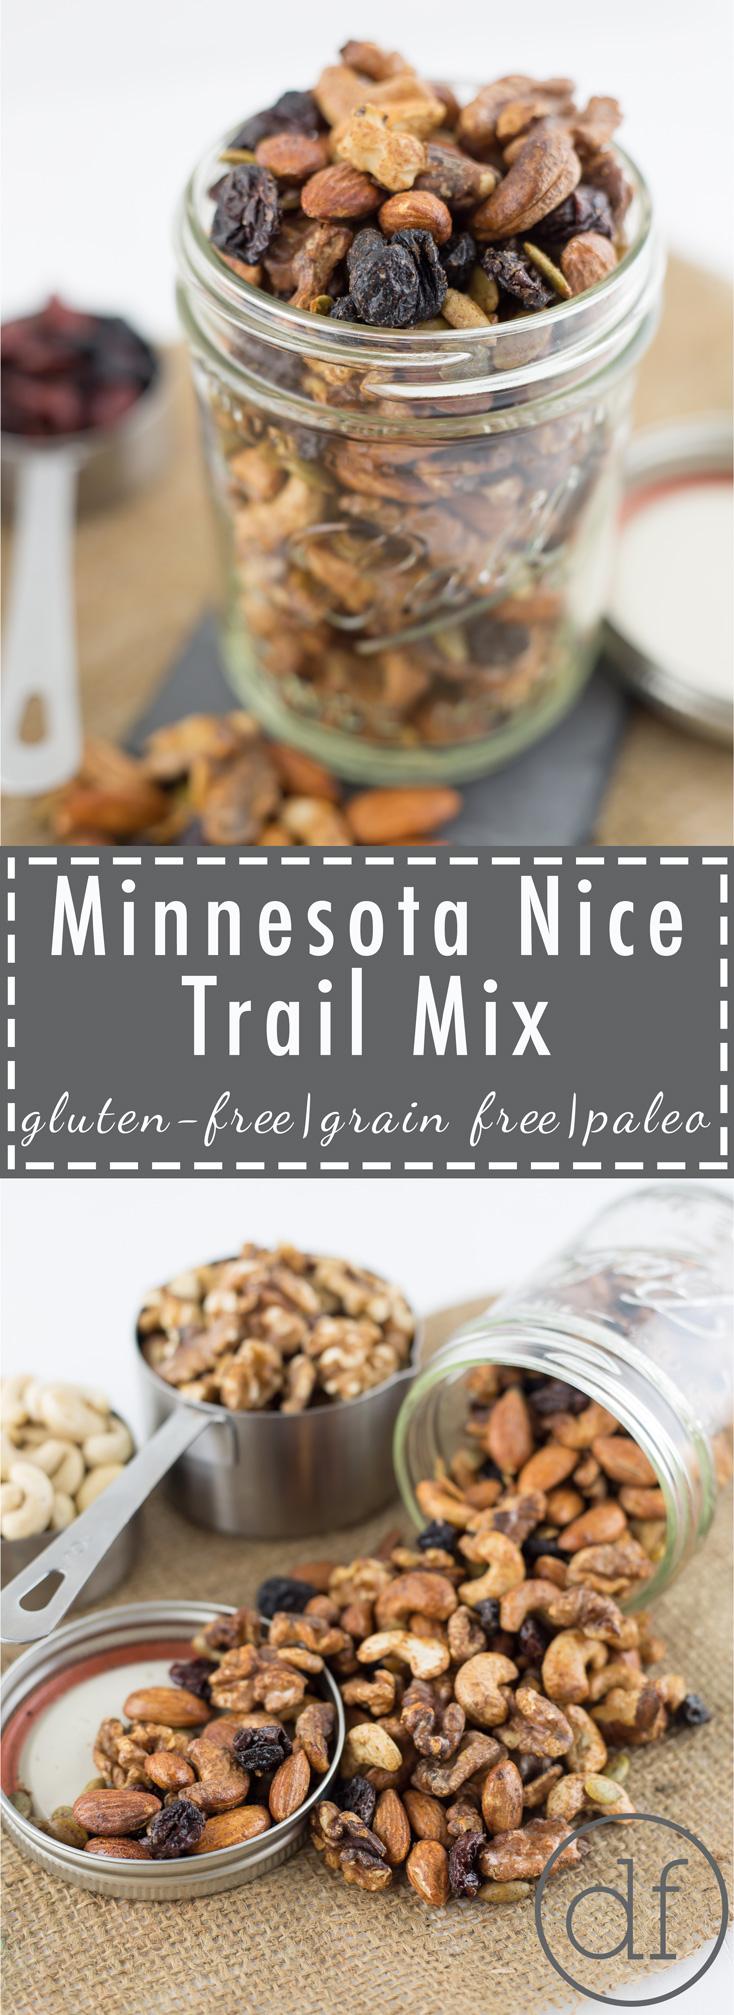 MN nice trail mix, grain free, gluten free, dairy free, paleo, north shore hiking, paleo recipes, define fettle, primal